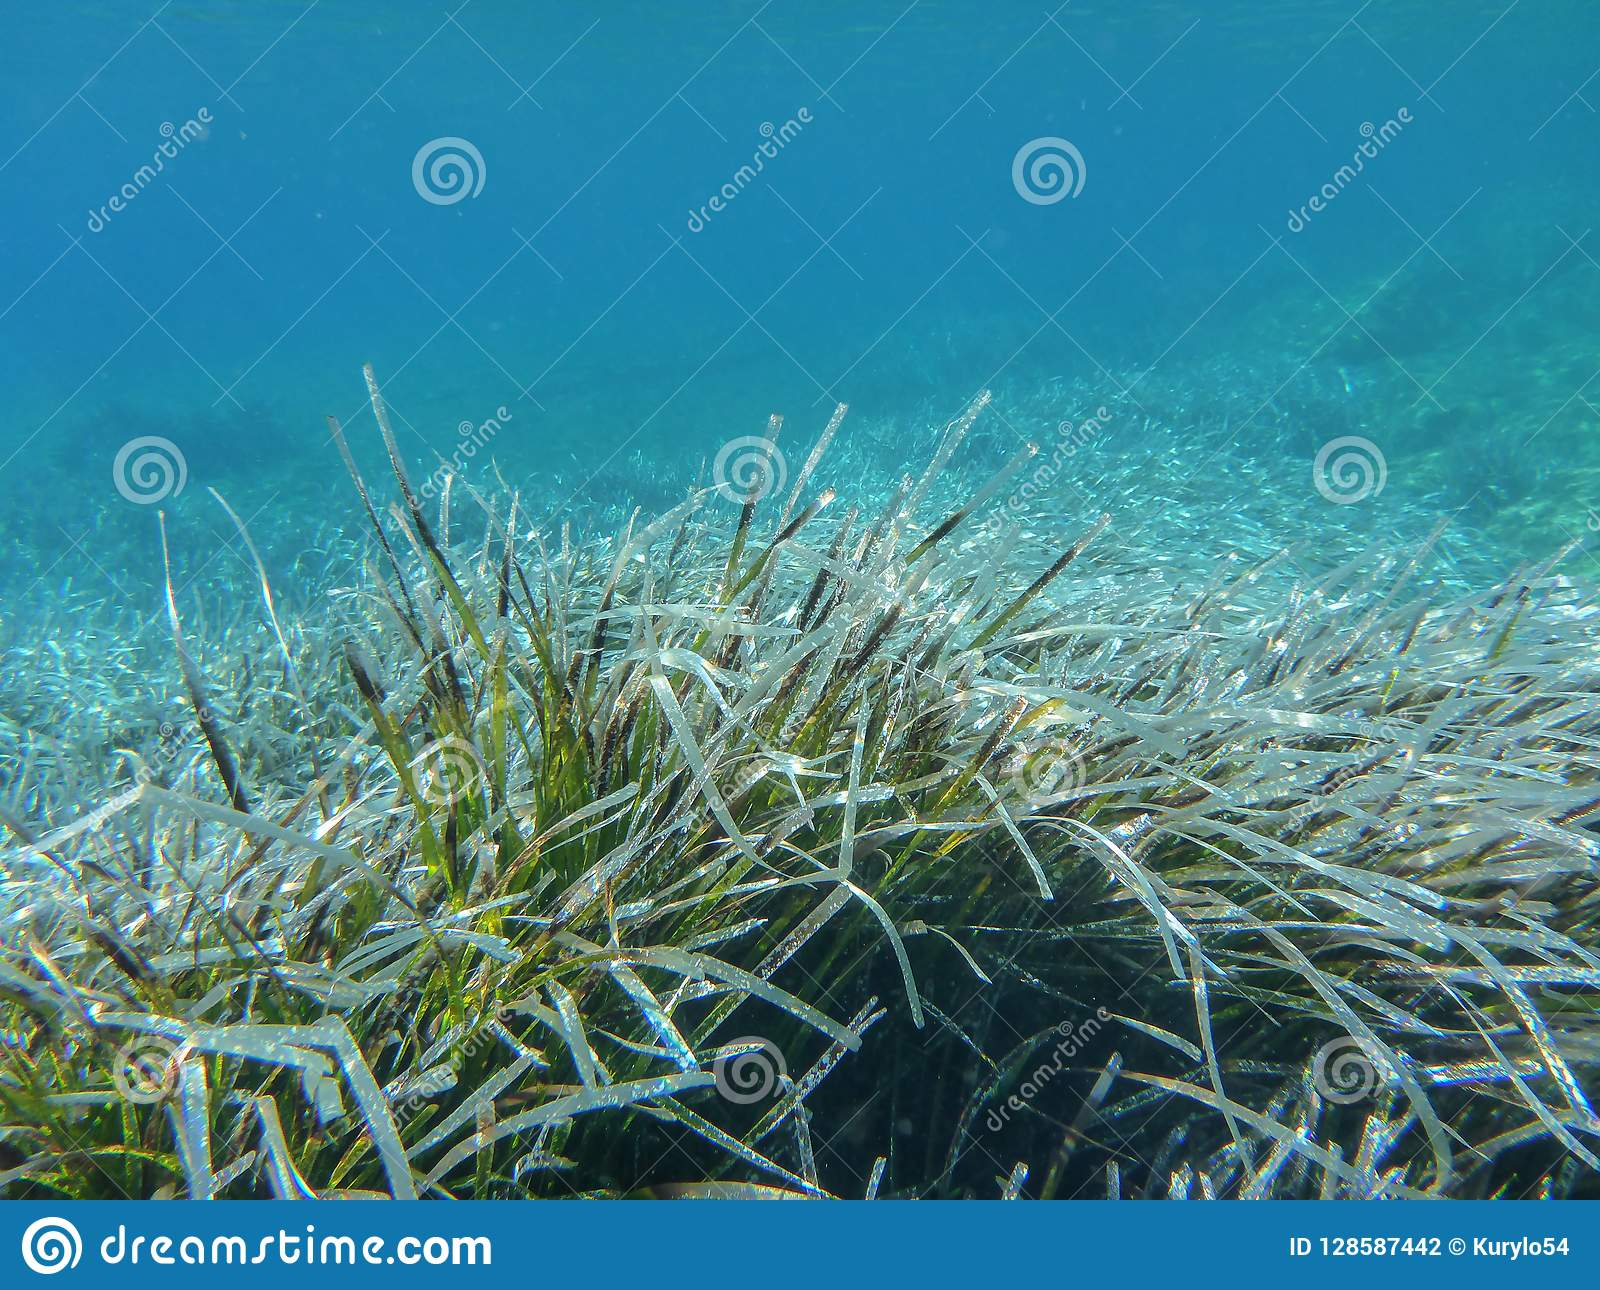 Underwater life - water plants in Kolona double bay Kythnos island Cyclades Greece, Aegean sea.